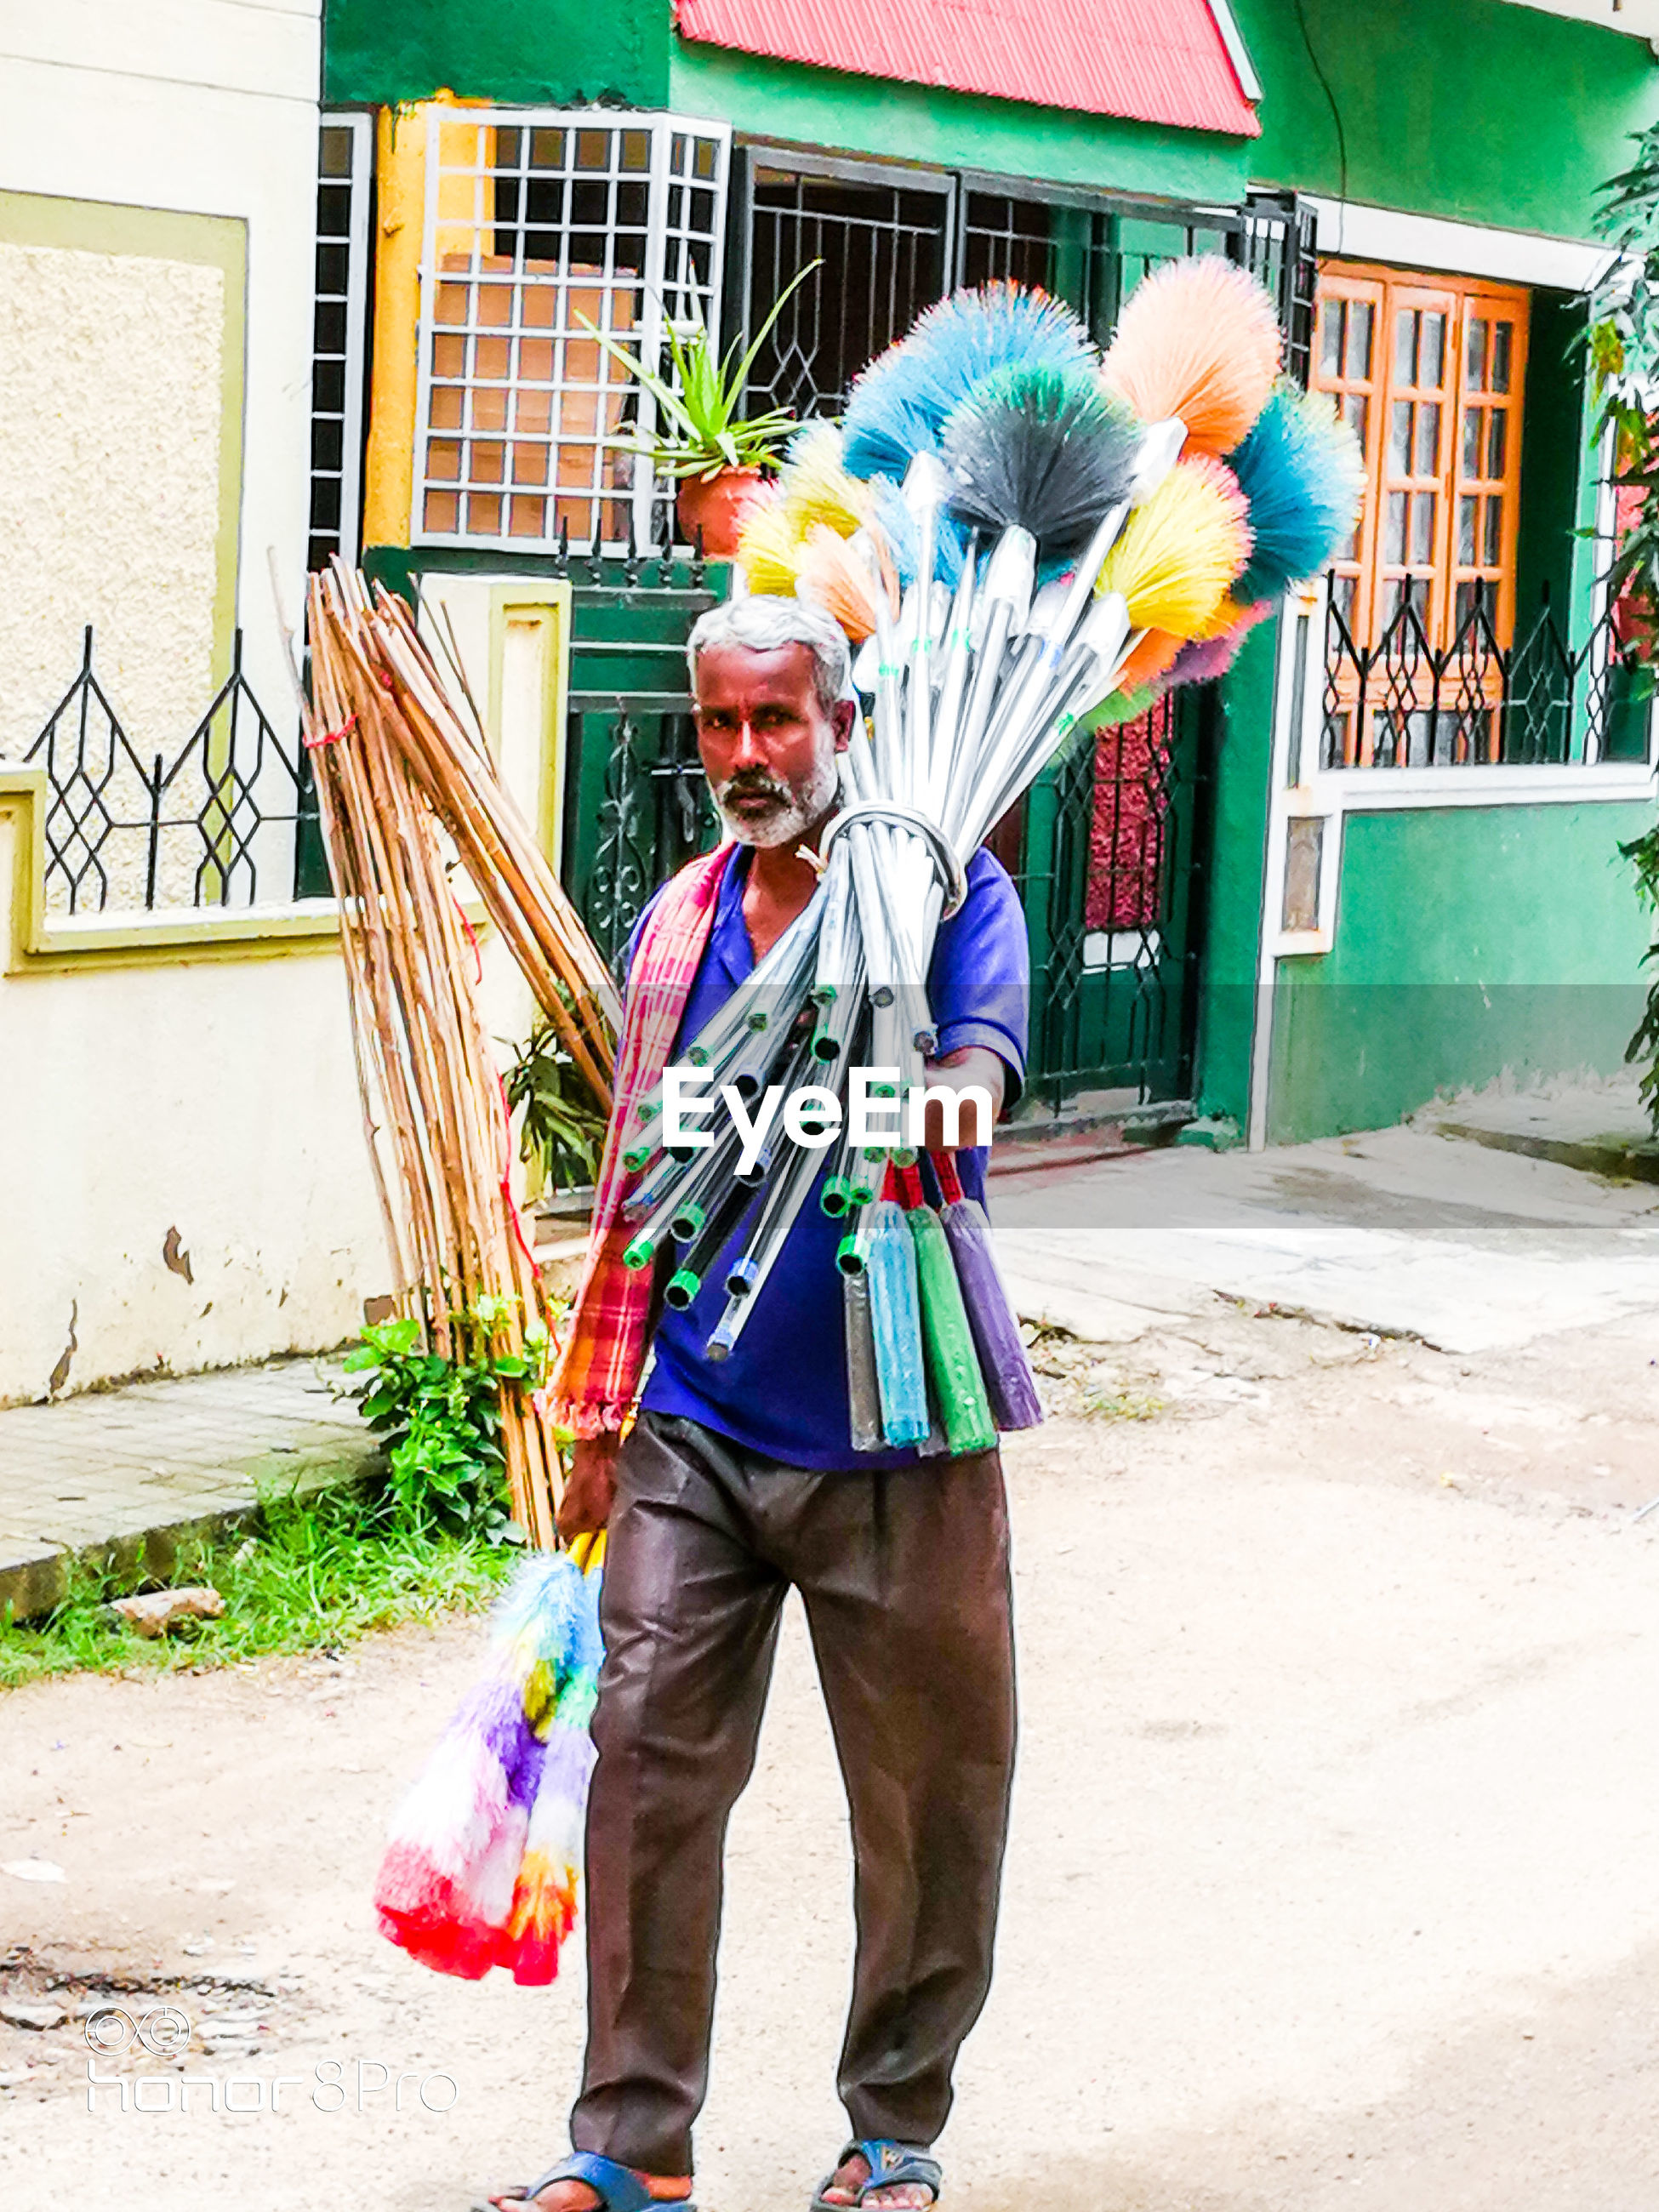 Portrait of man selling brooms in market